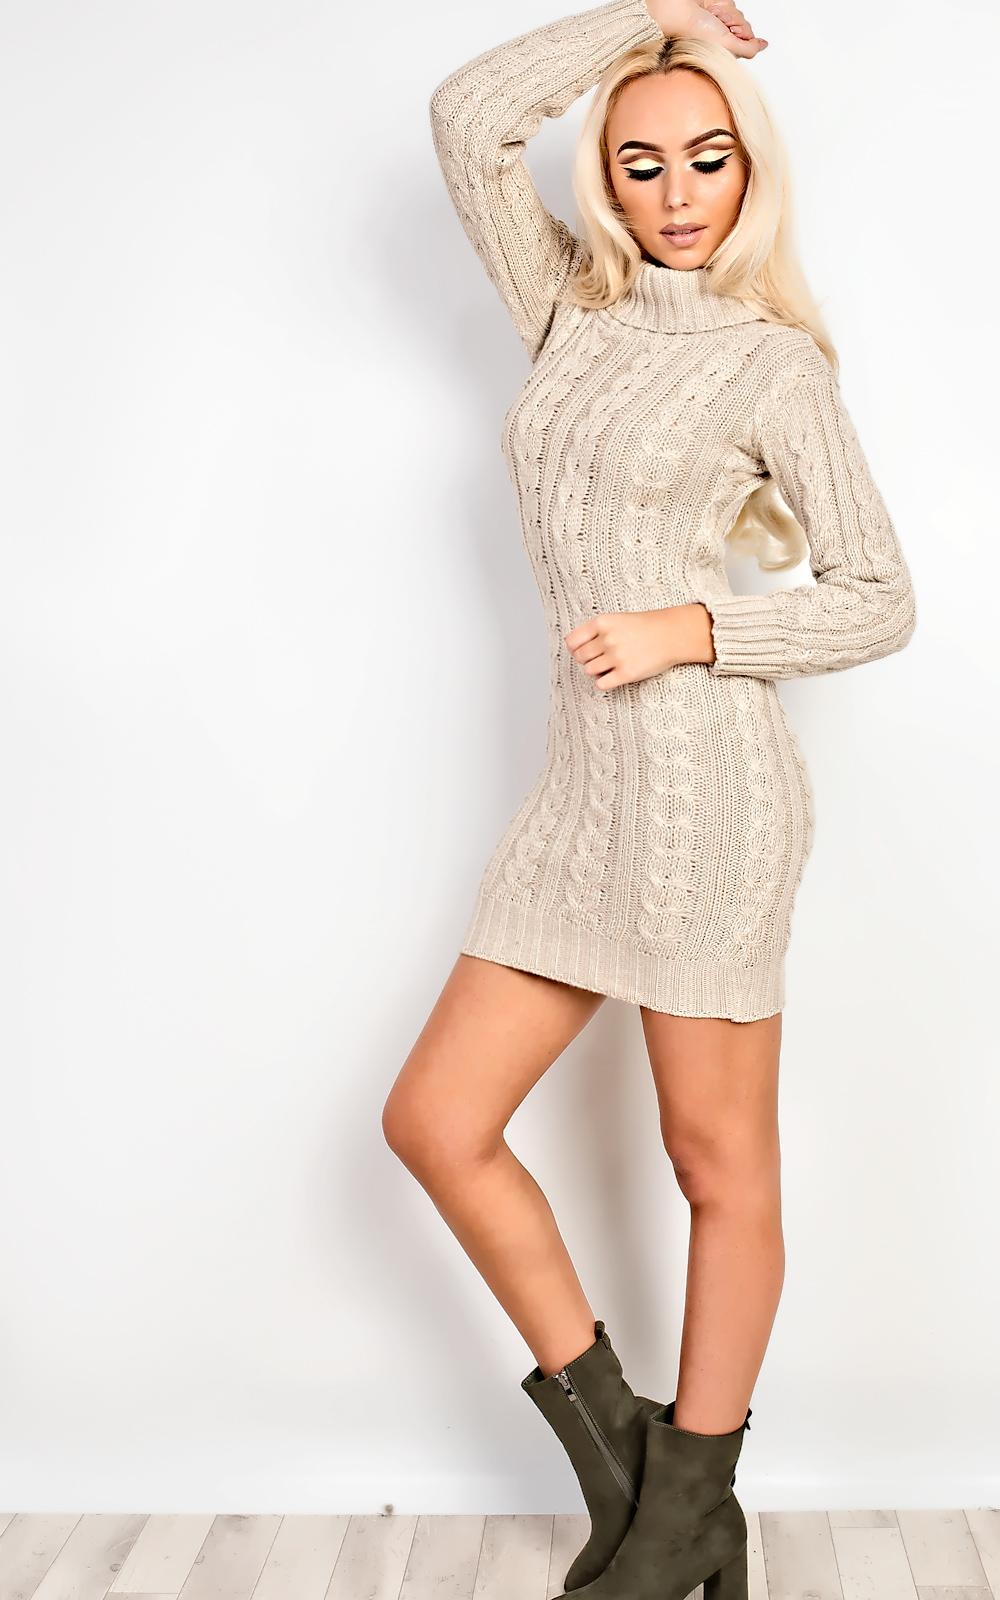 2f499943057 IKRUSH Women s Addison High Neck Knit Dress in STONE Size M L ...